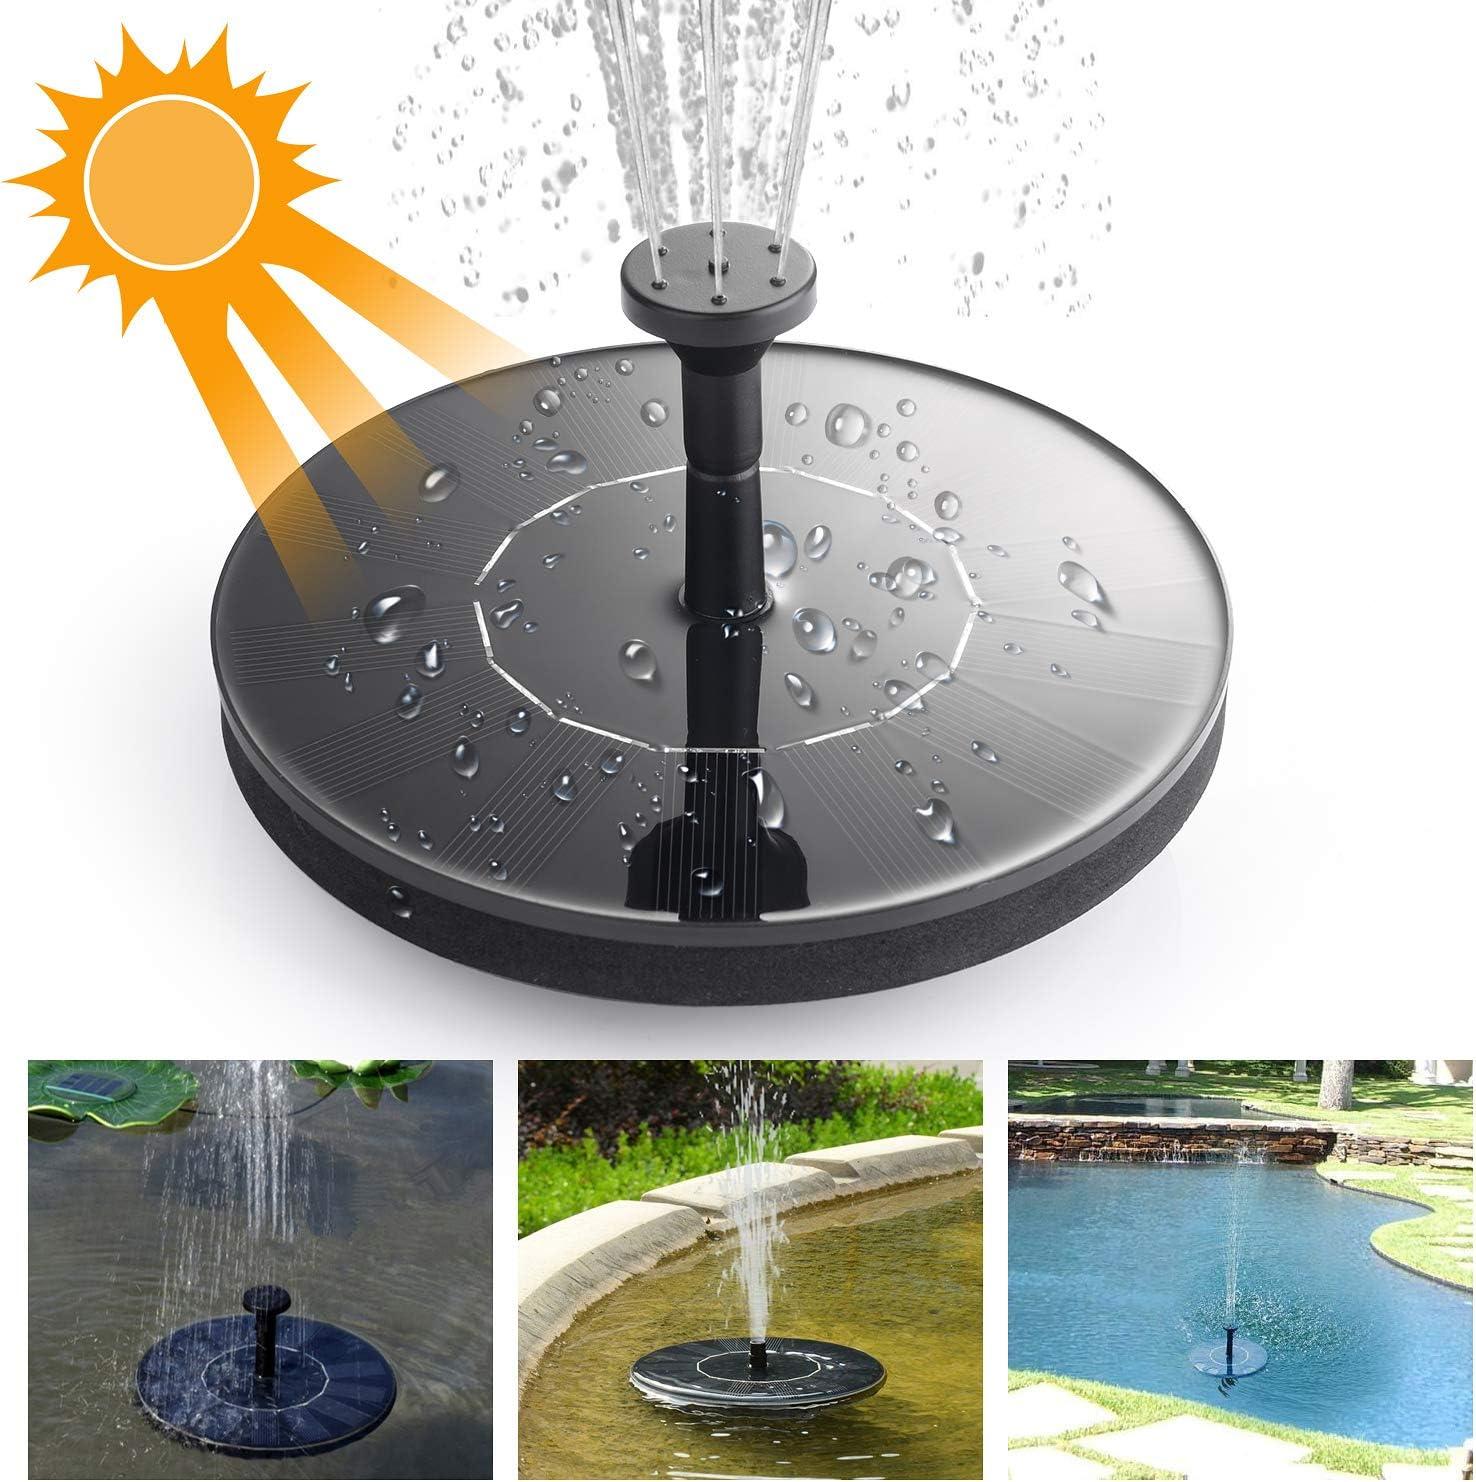 Ulikey Fuente Solar Bomba, Bomba de Agua Solar - 1.4W Bomba de Fuente Solar, Energía Solar al Aire Libre de pie Fountain Pump Solar Kit de Bomba de Agua, Patio Jardín Decoración